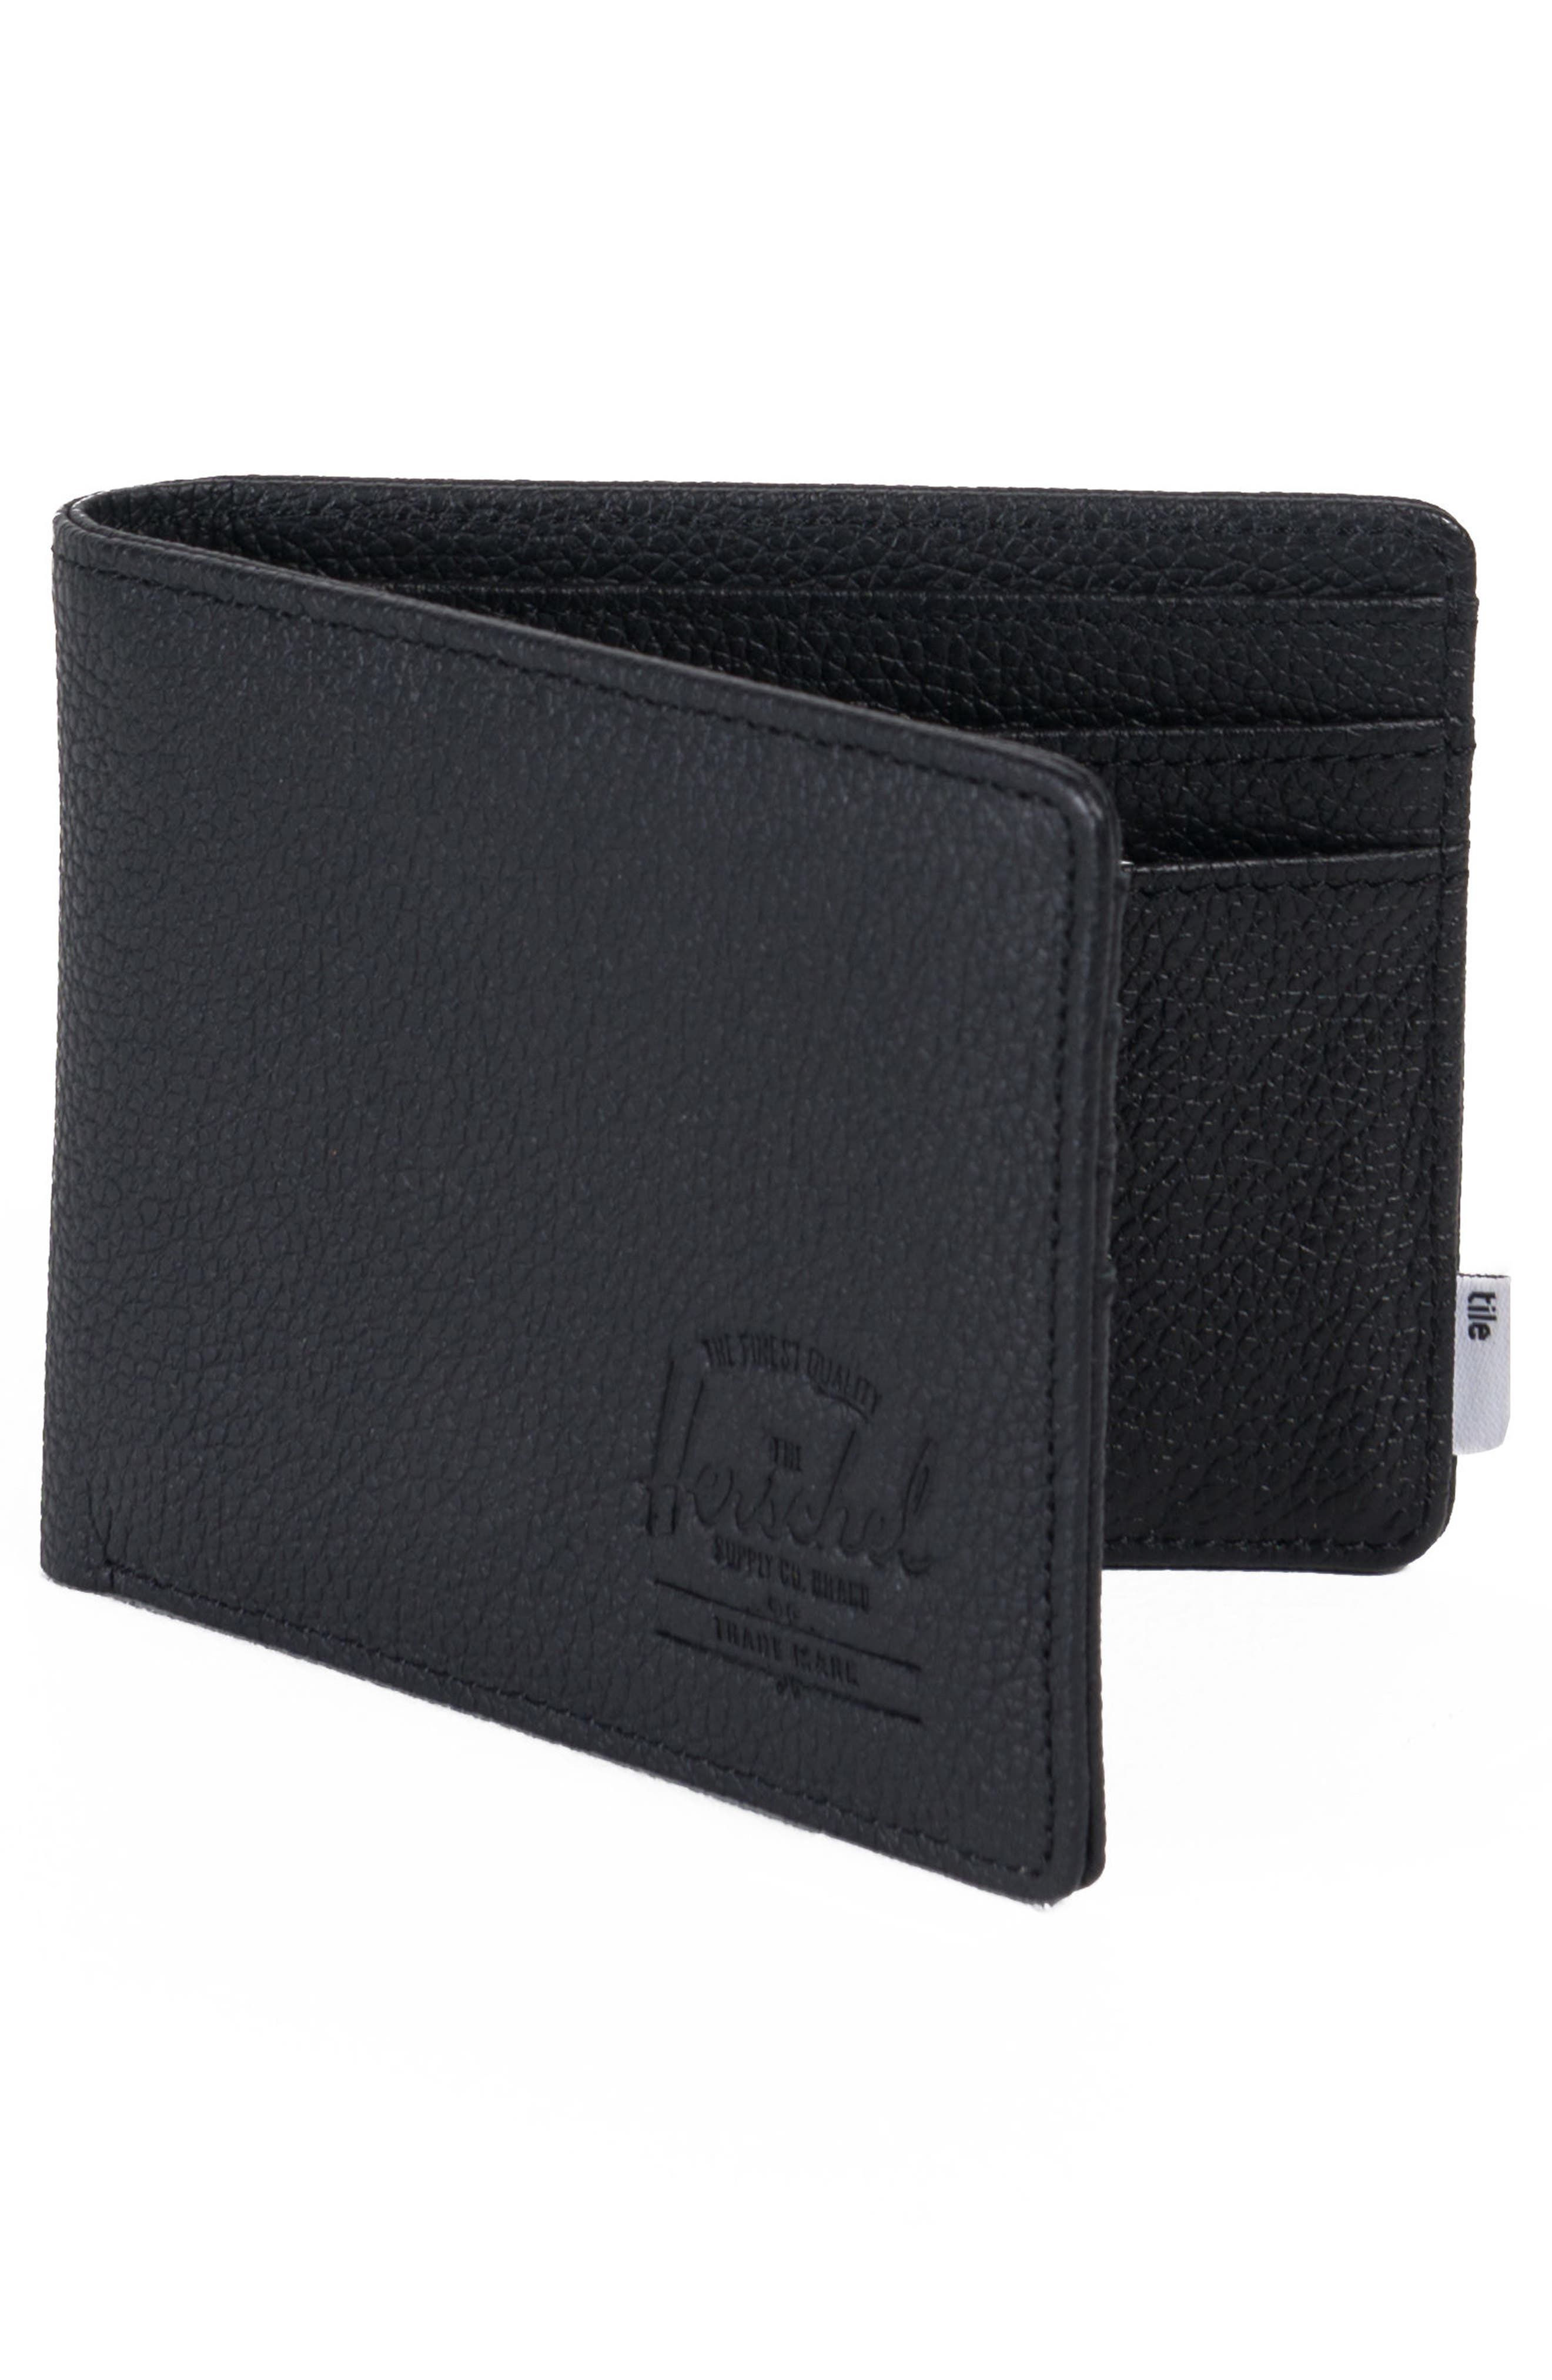 Tile Roy Leather Wallet,                             Alternate thumbnail 2, color,                             001